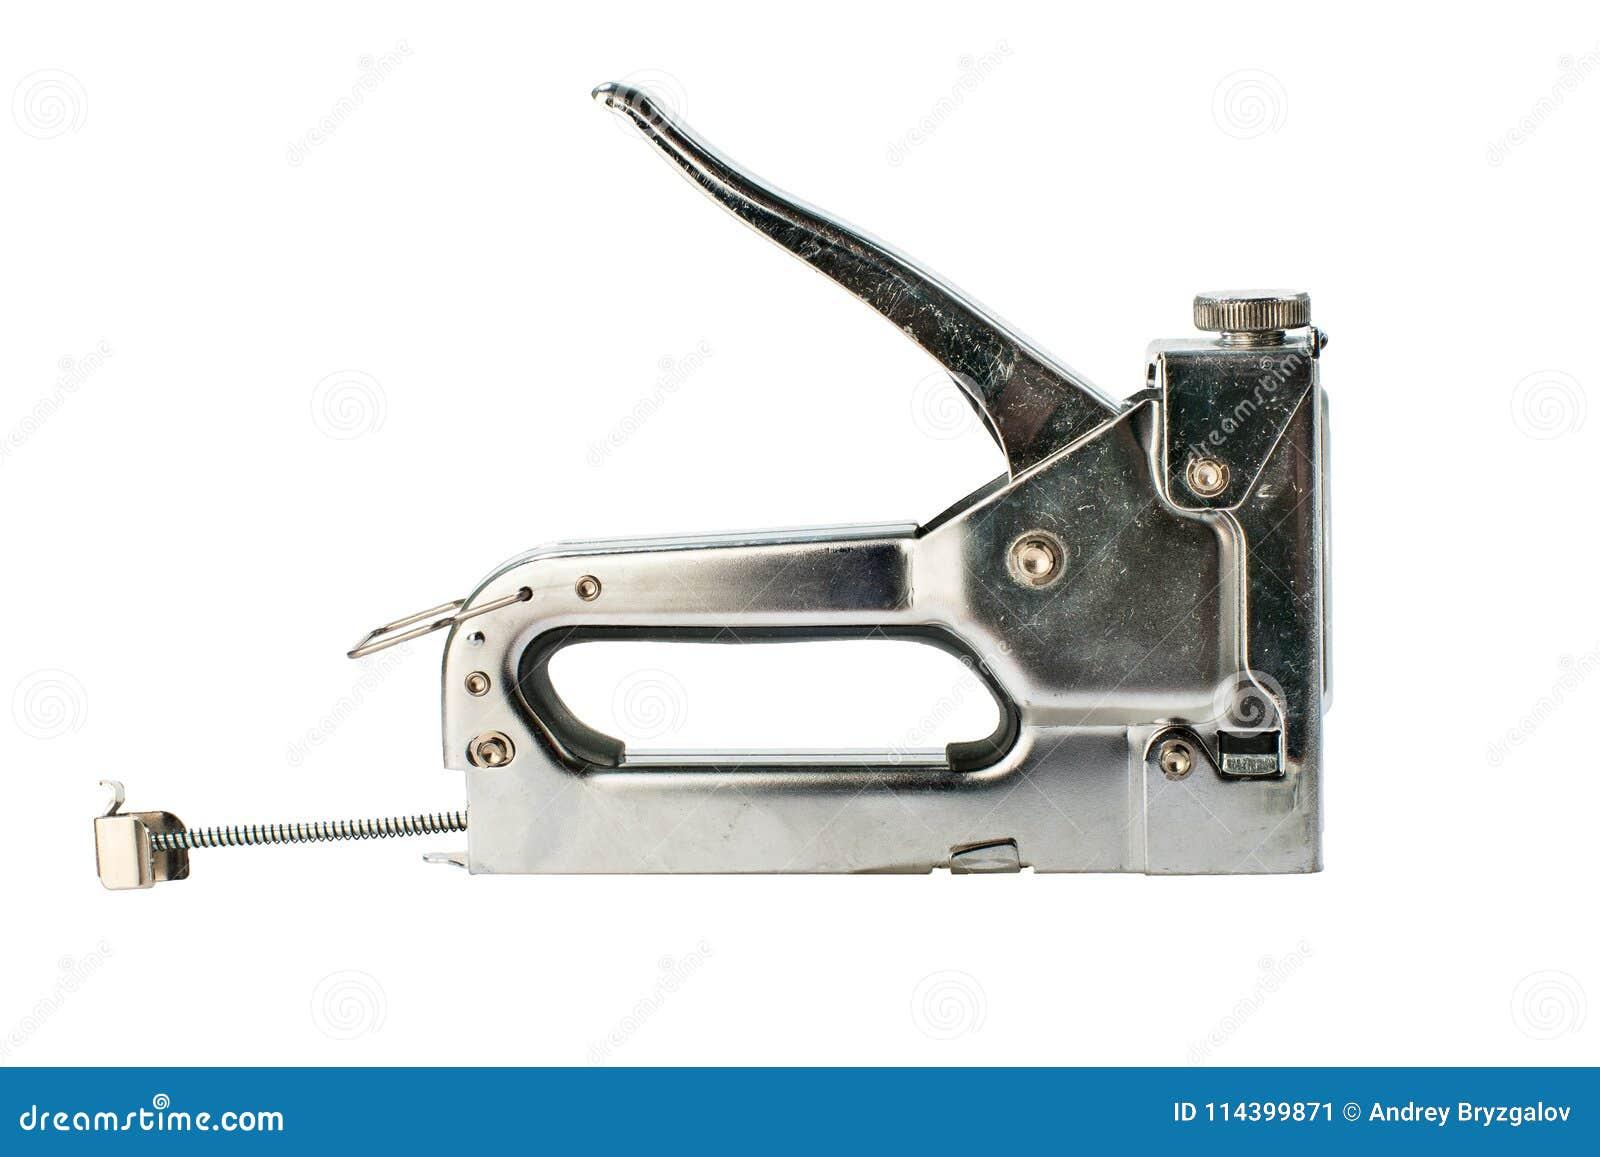 Chrome Construction stapler isolated on white background